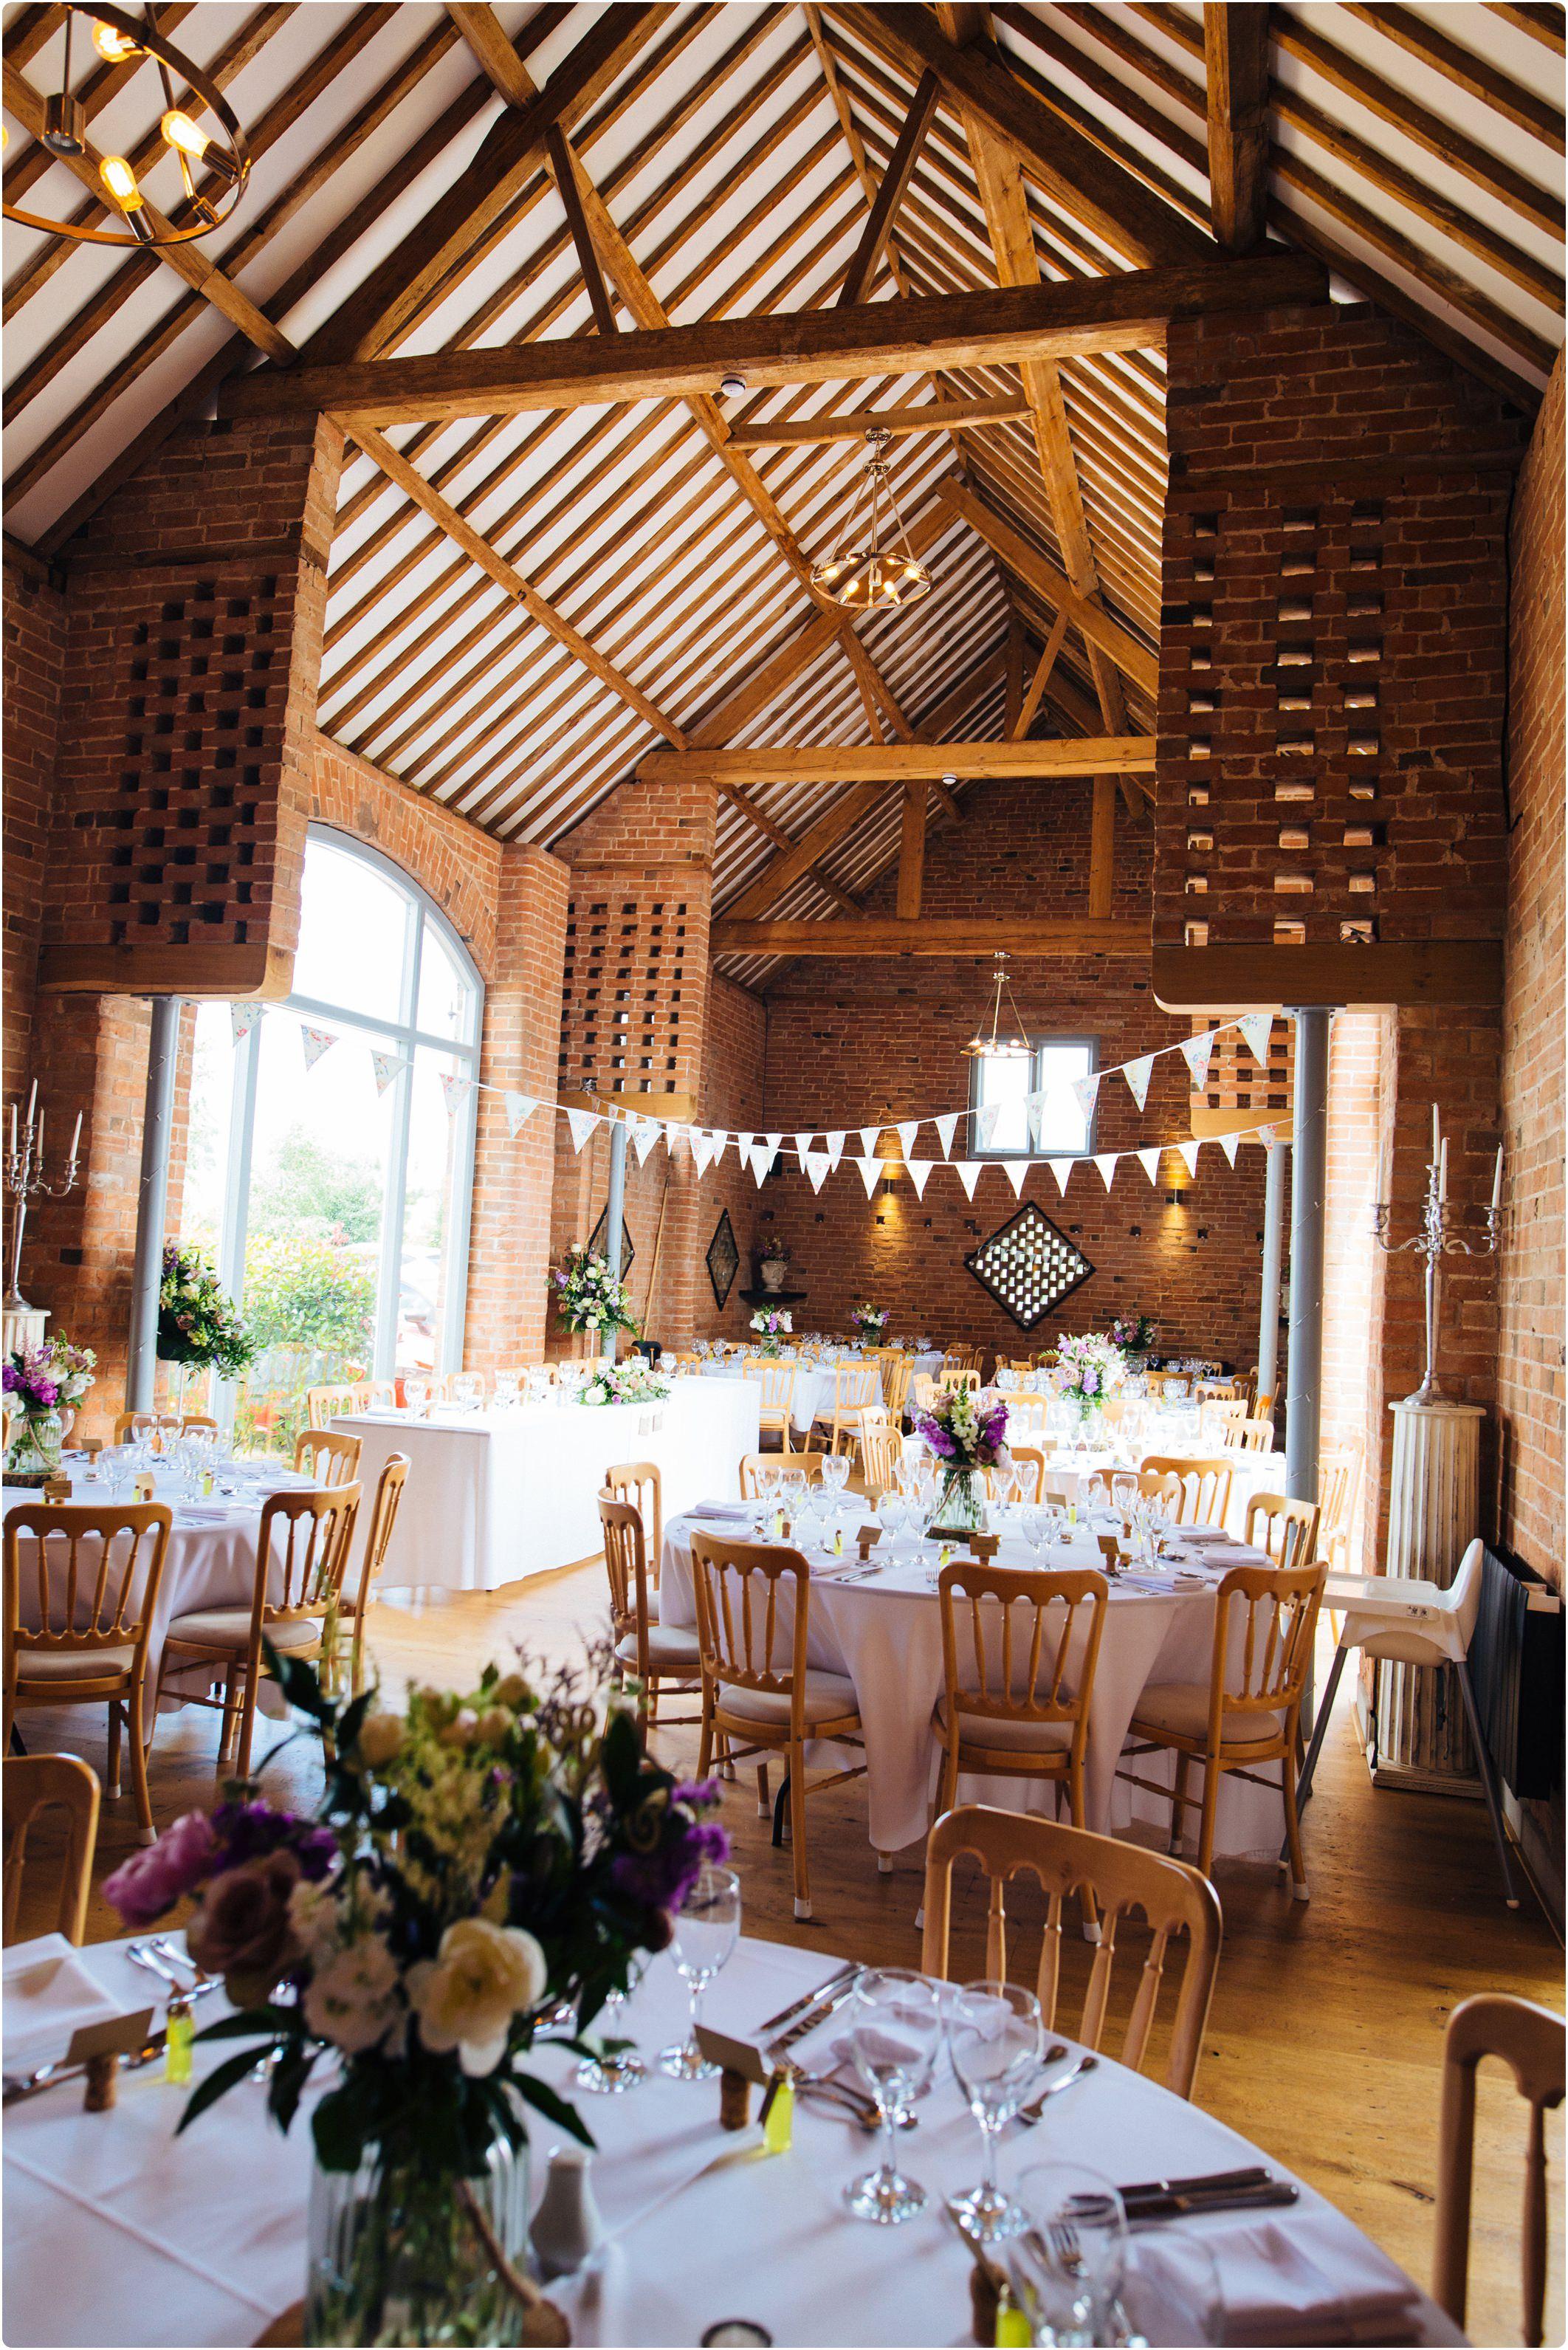 Swallows Nest Barn wedding table set up